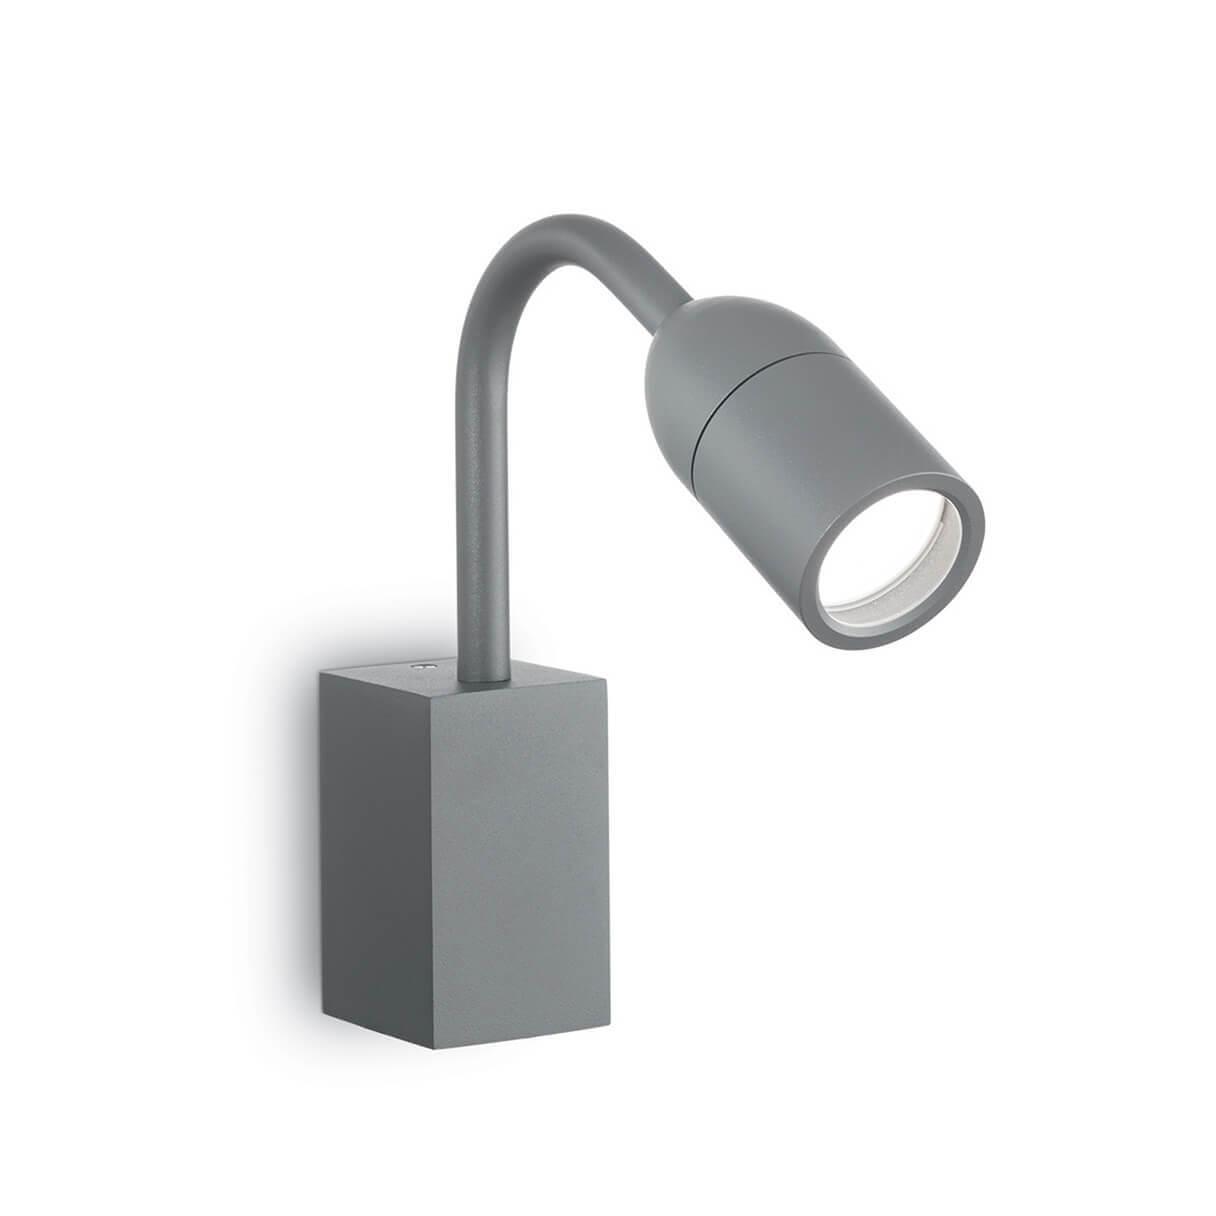 цена Светильник Ideal Lux Loop AP1 Antracite Loop онлайн в 2017 году